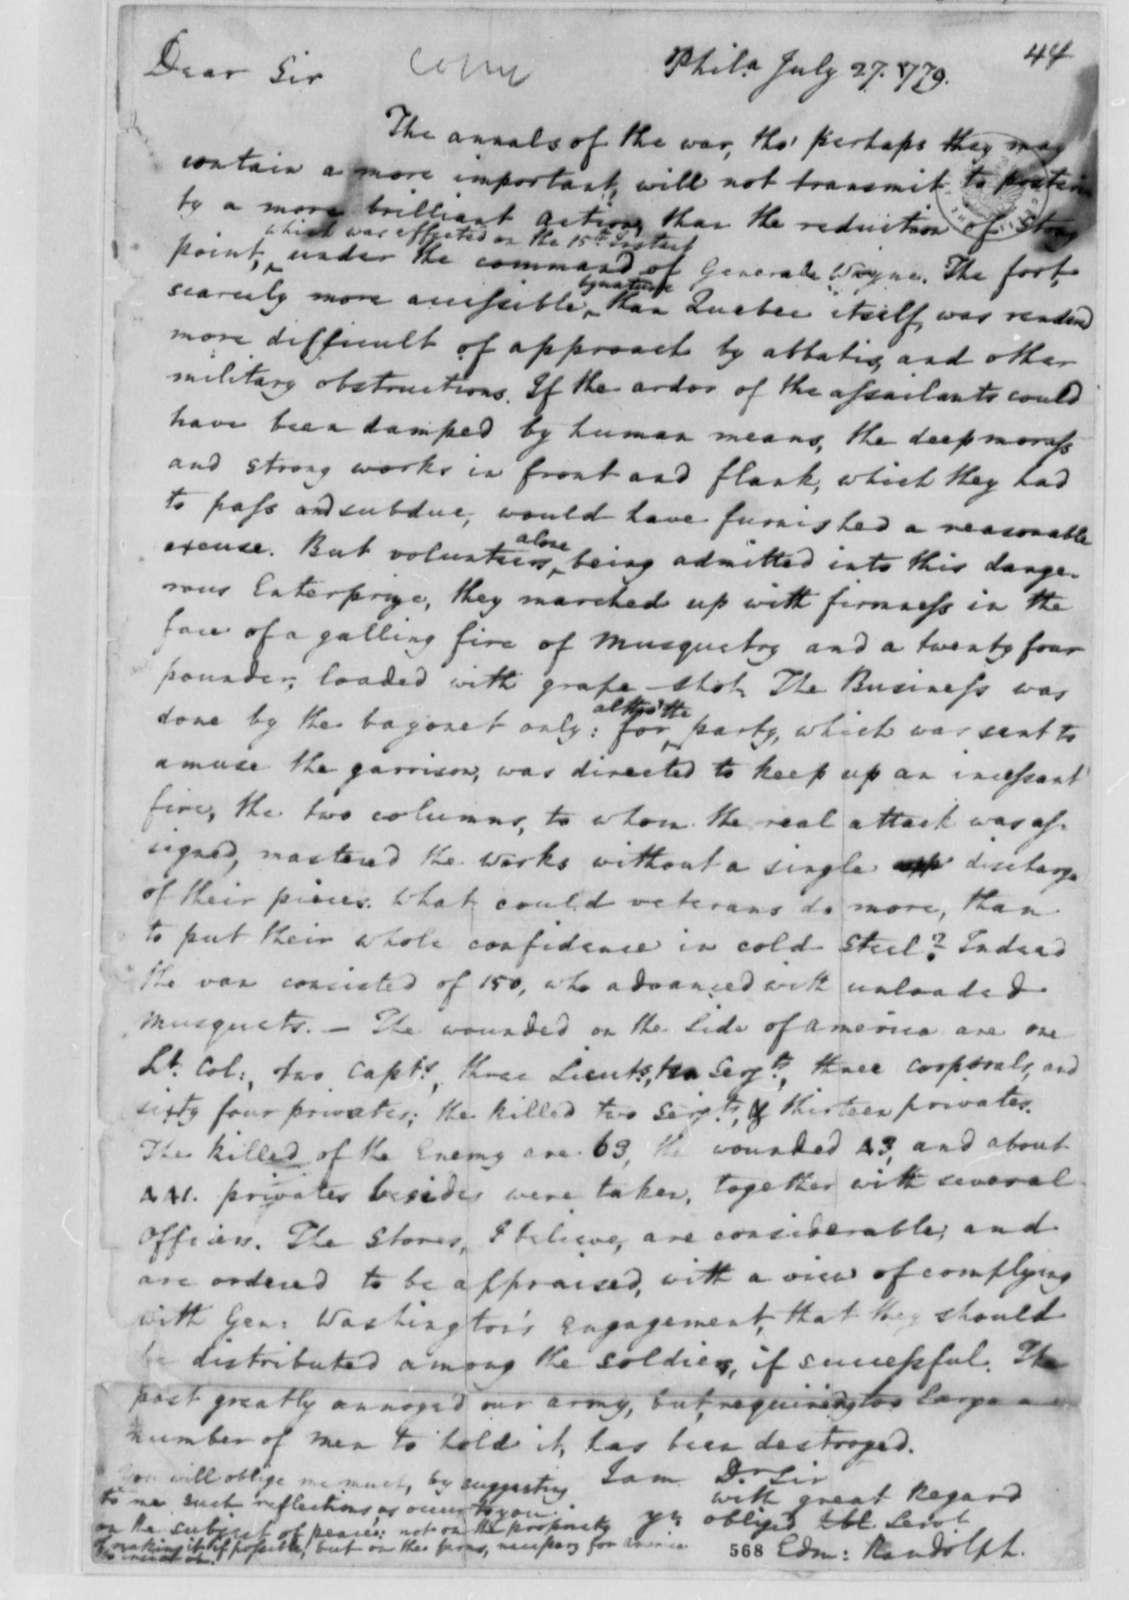 Edmund Randolph to Thomas Jefferson, July 27, 1779, Anthony Wayne's Capture of Stony Point on the Hudson River